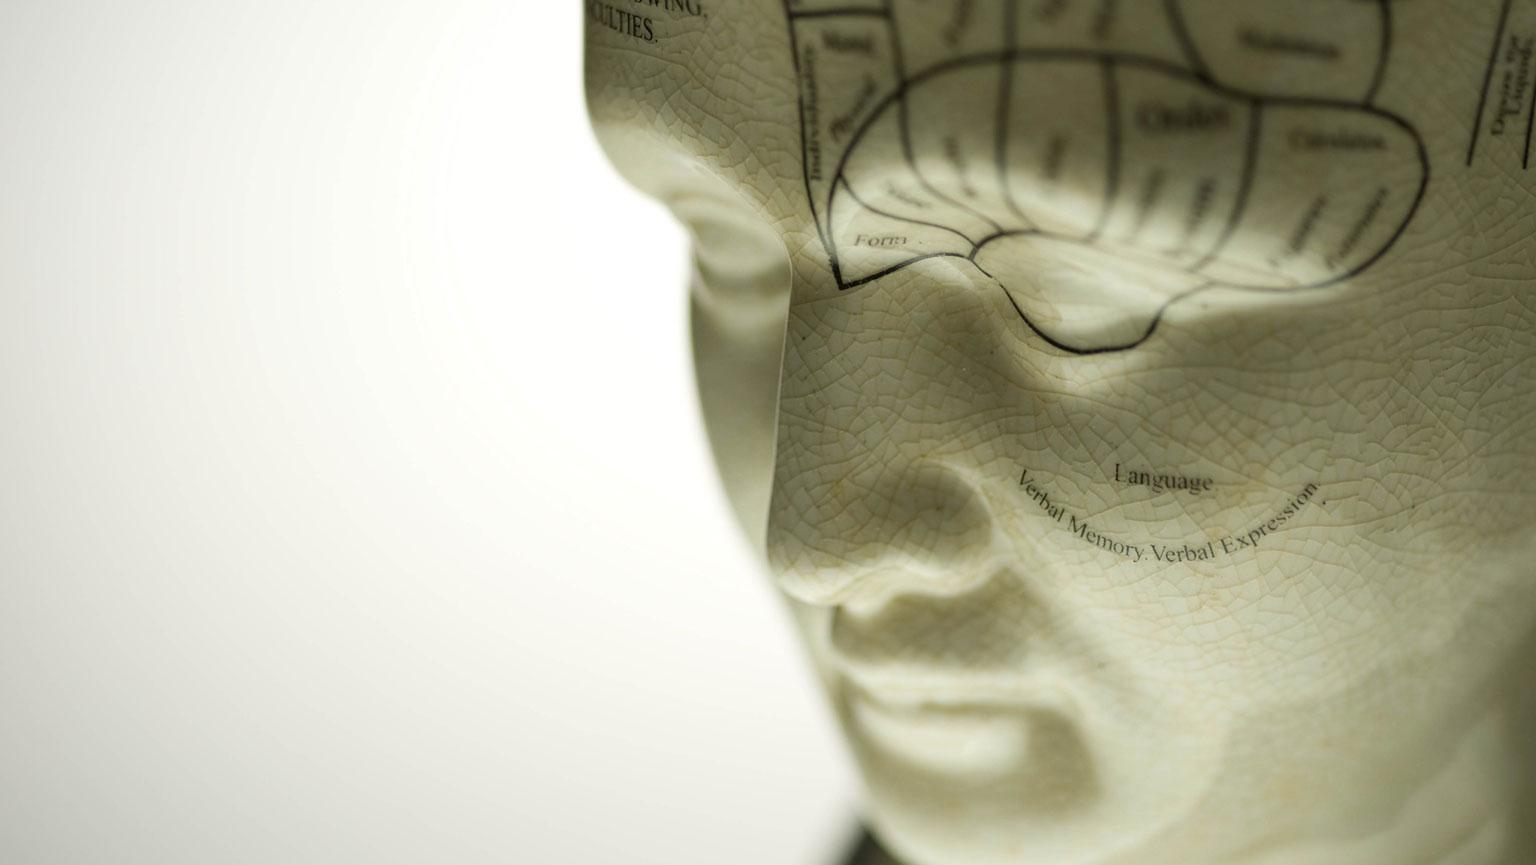 Neuroscience—Looking Back and Looking Ahead